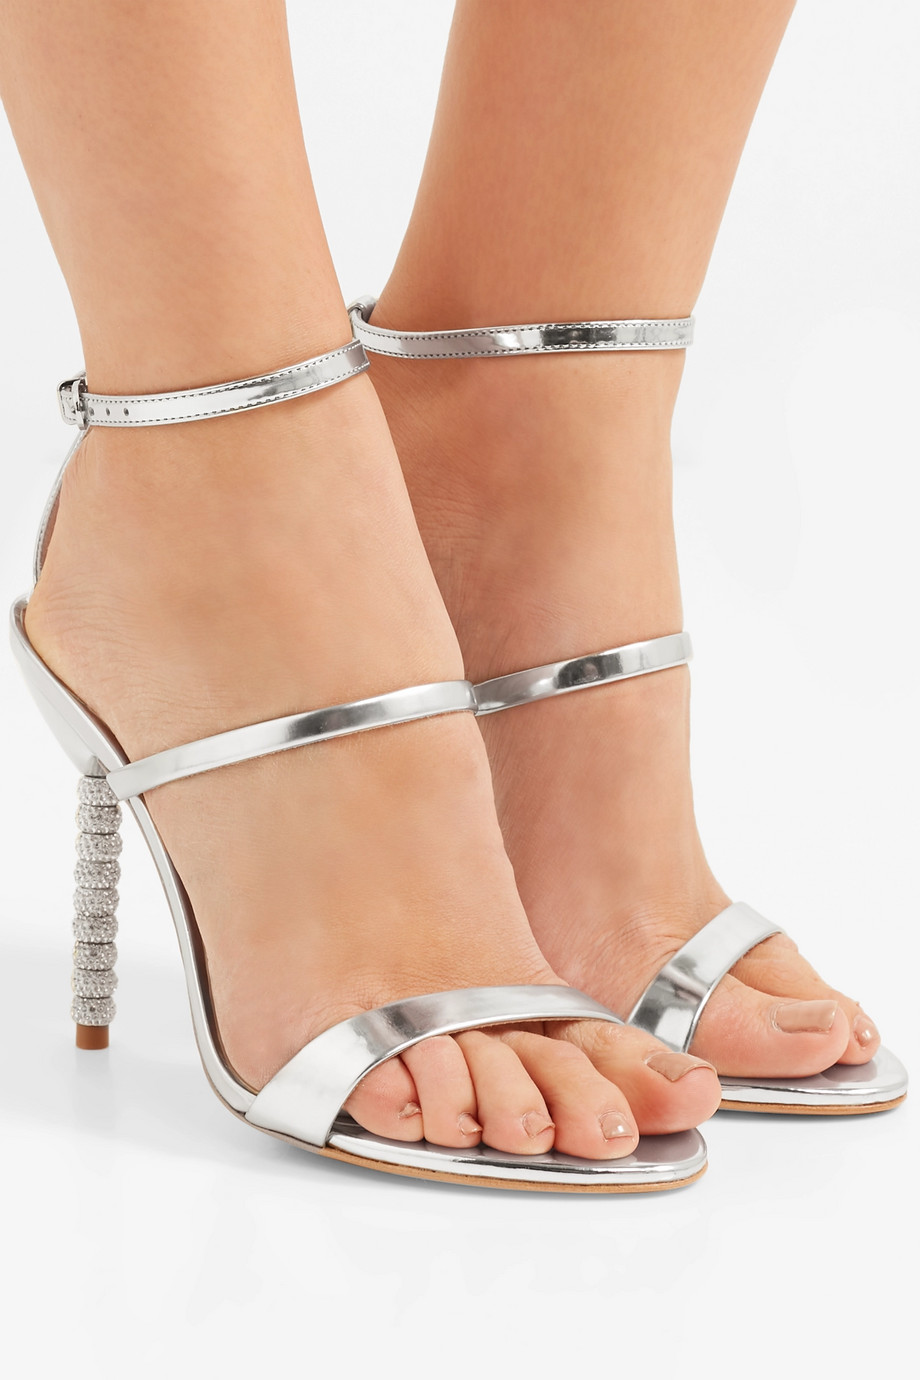 Sophia Webster Rosalind Sandalen aus Metallic-Leder mit Kristallen